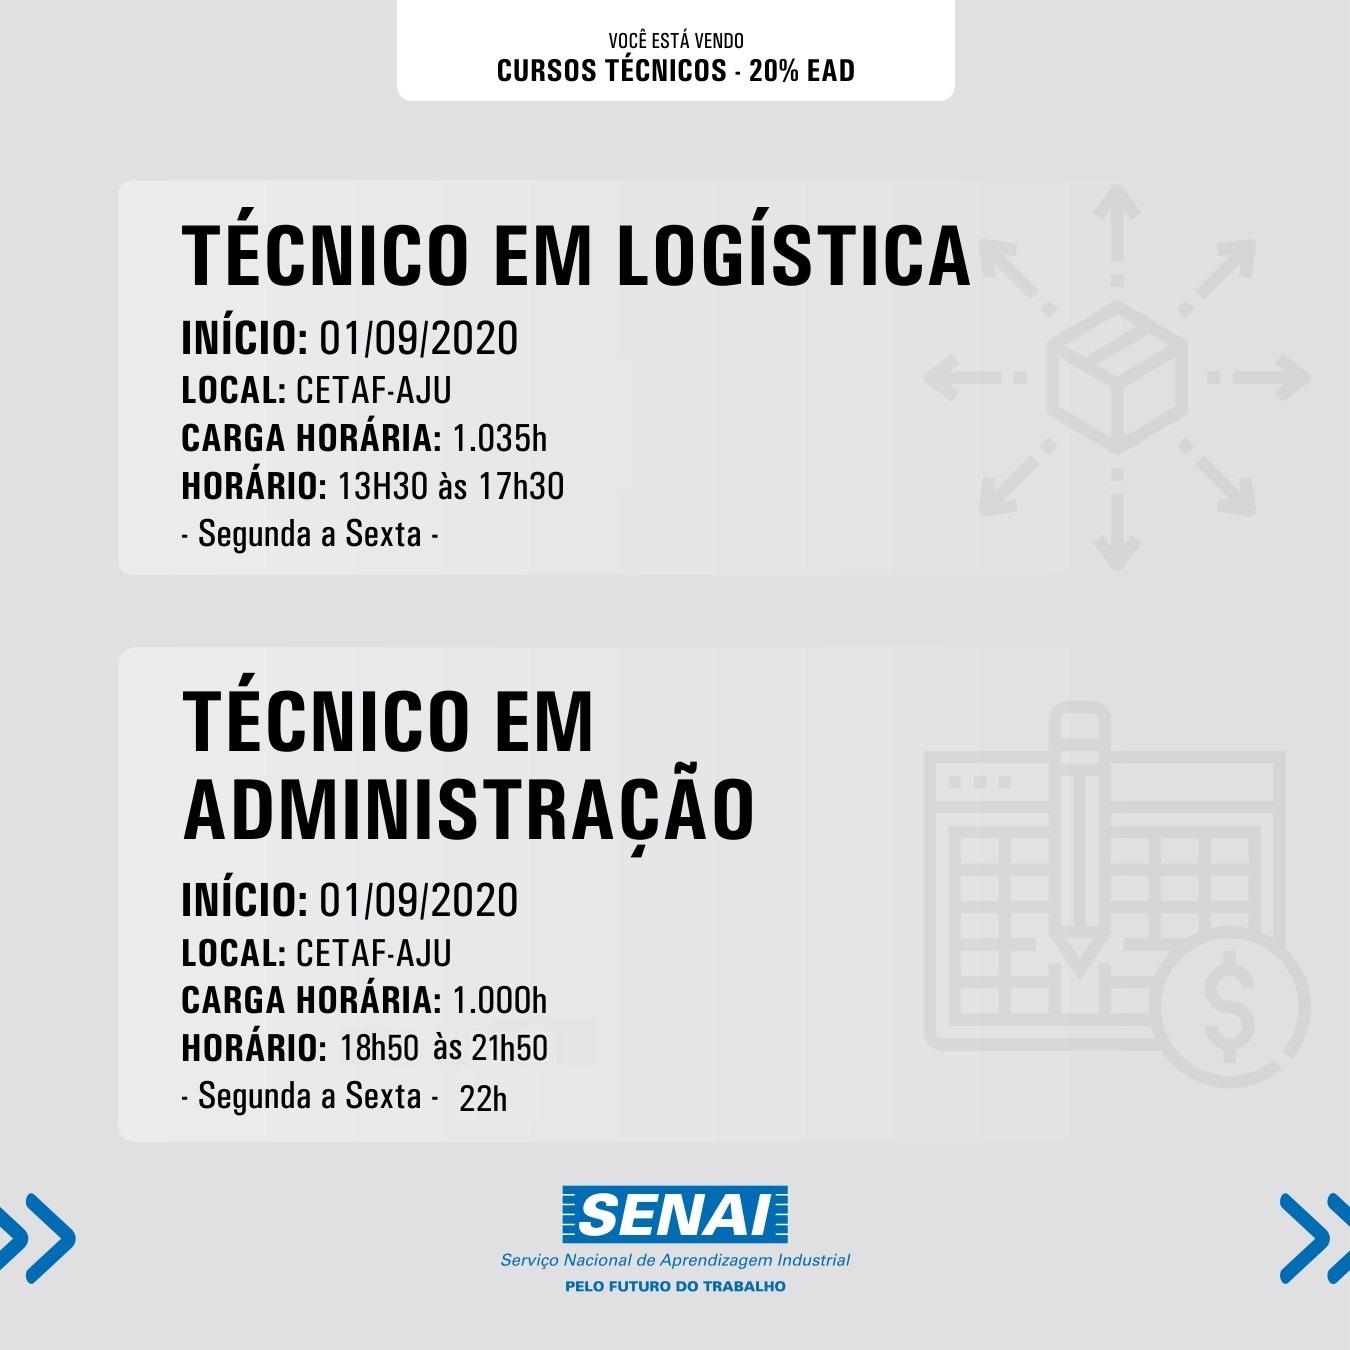 TELA03 - SENAI_PROGRAMACAO_GRATUITO_VER2.jpg